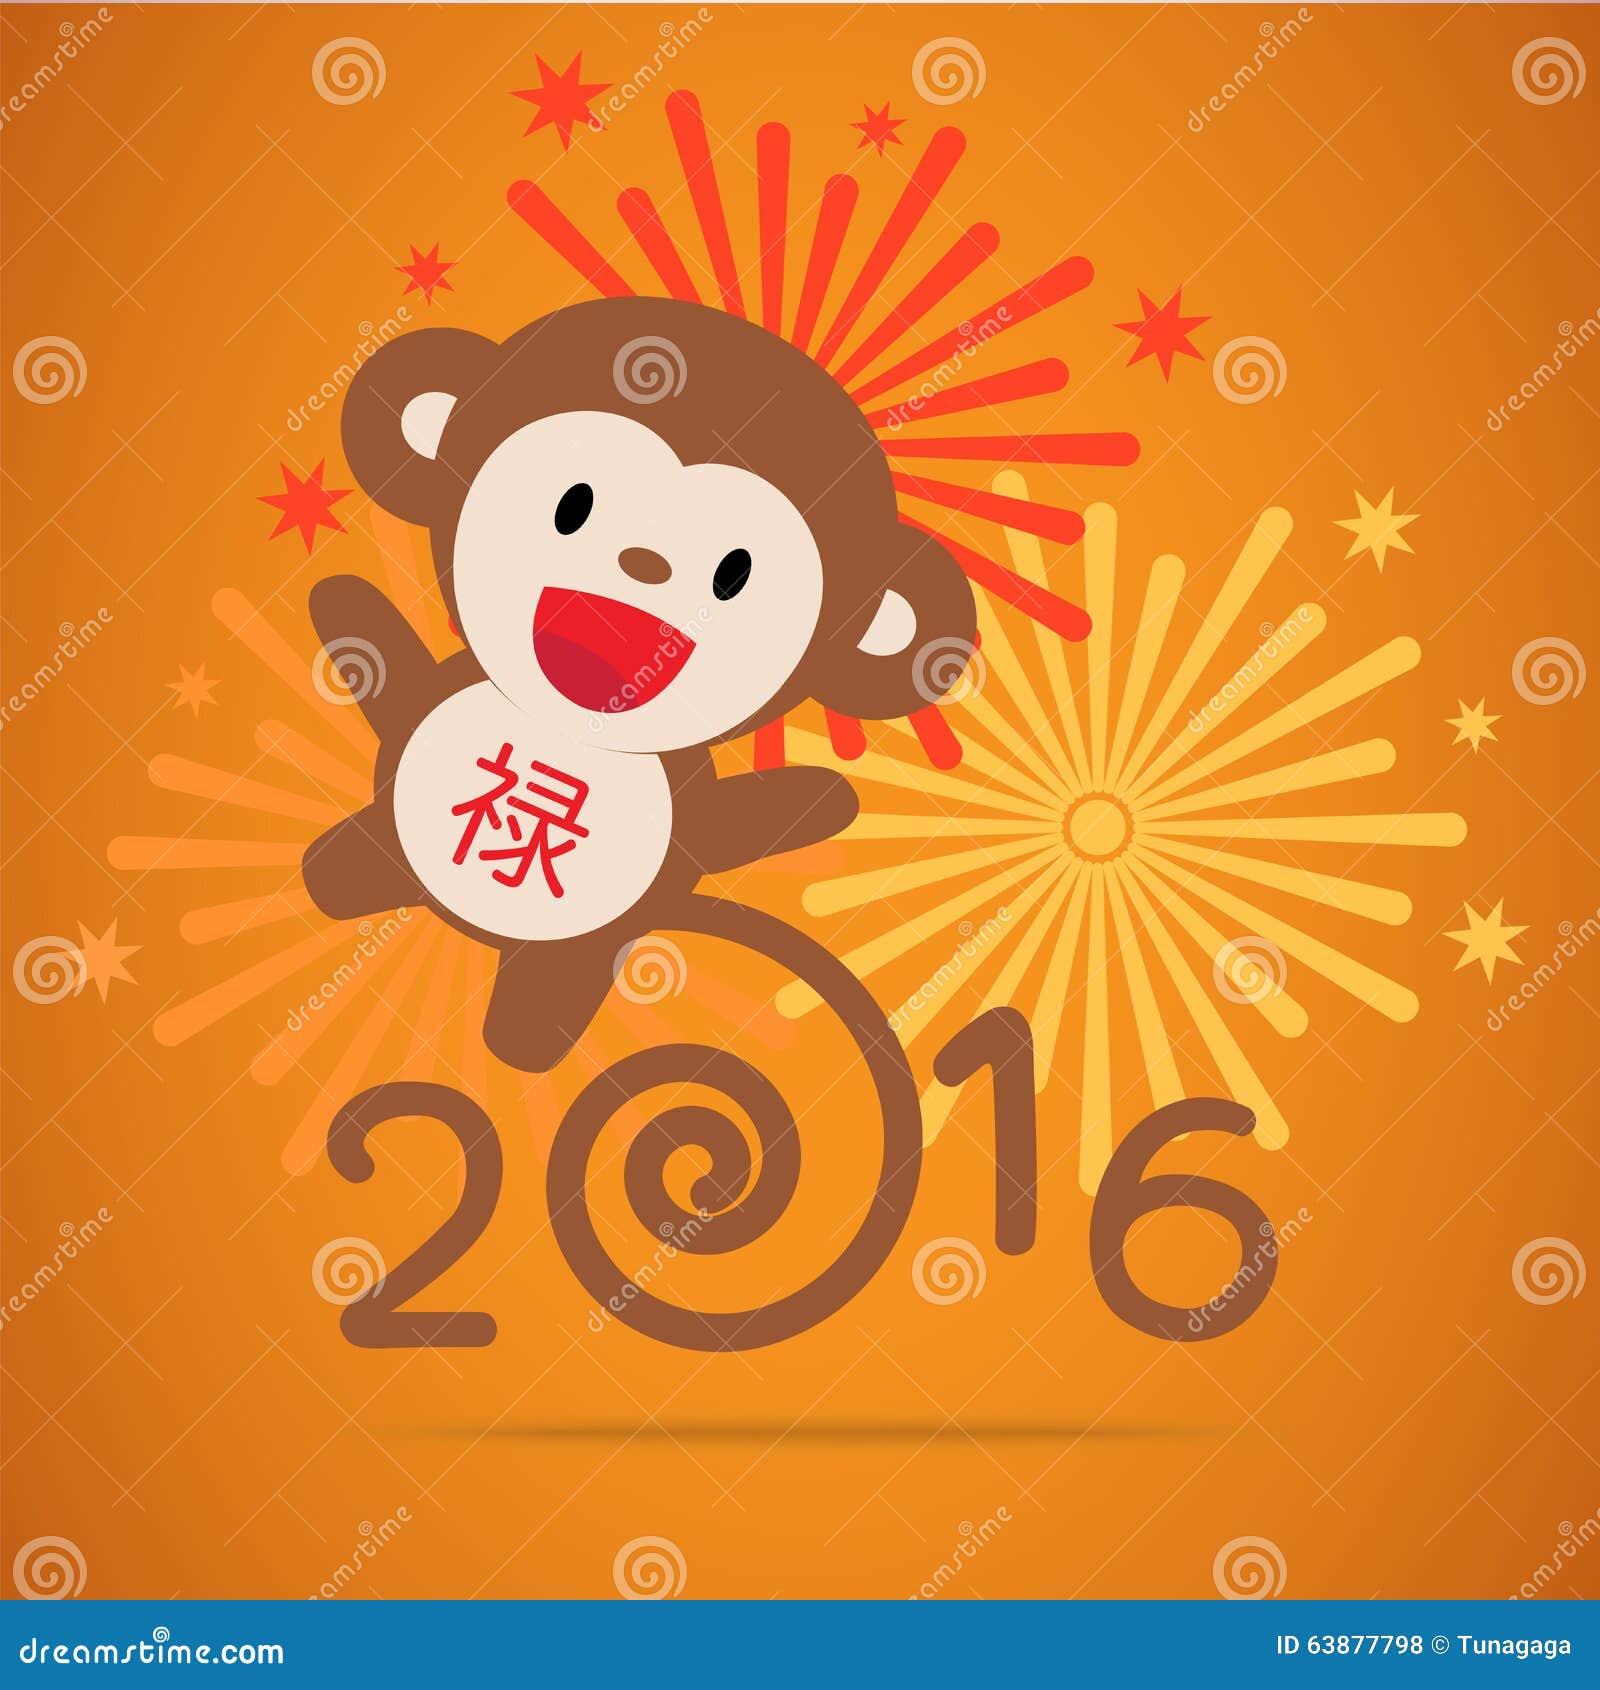 2016 monkey chinese new year greeting card design stock vector 2016 monkey chinese new year greeting card design kristyandbryce Gallery